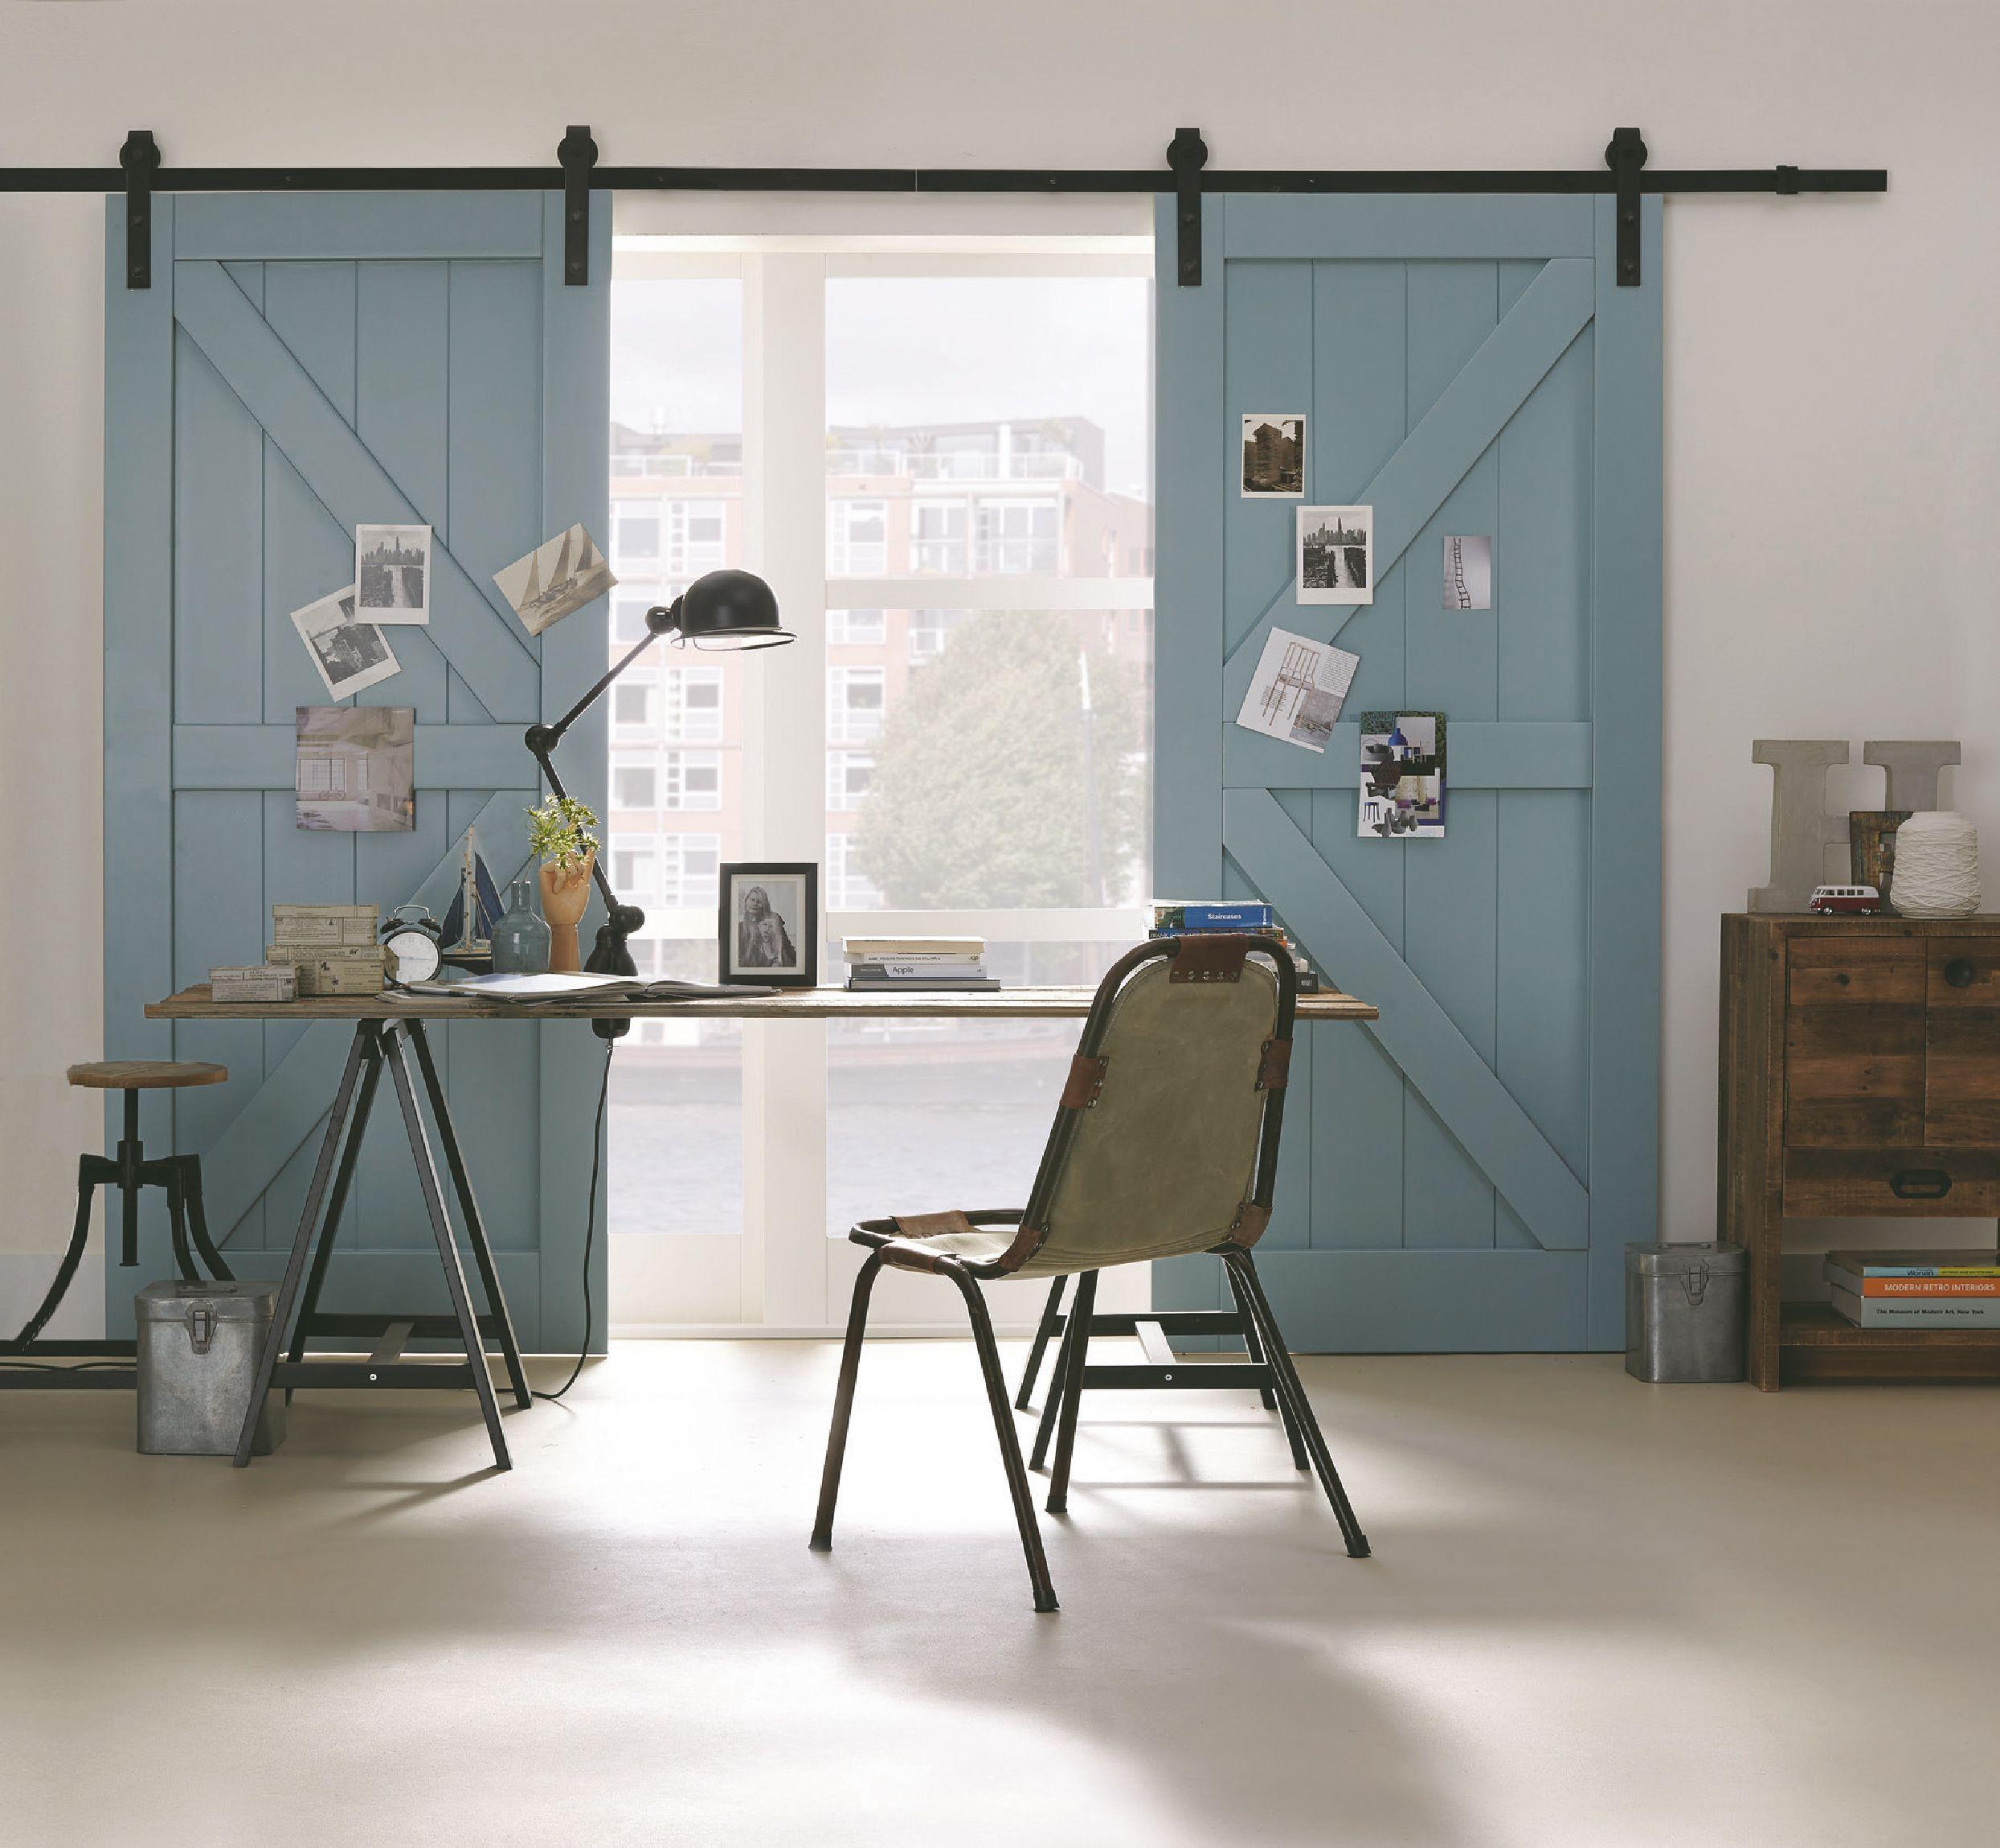 Stoel Wieltjes Praxis : Eetkamer lampen praxis kunststof stoelen ikea latest stoelen er